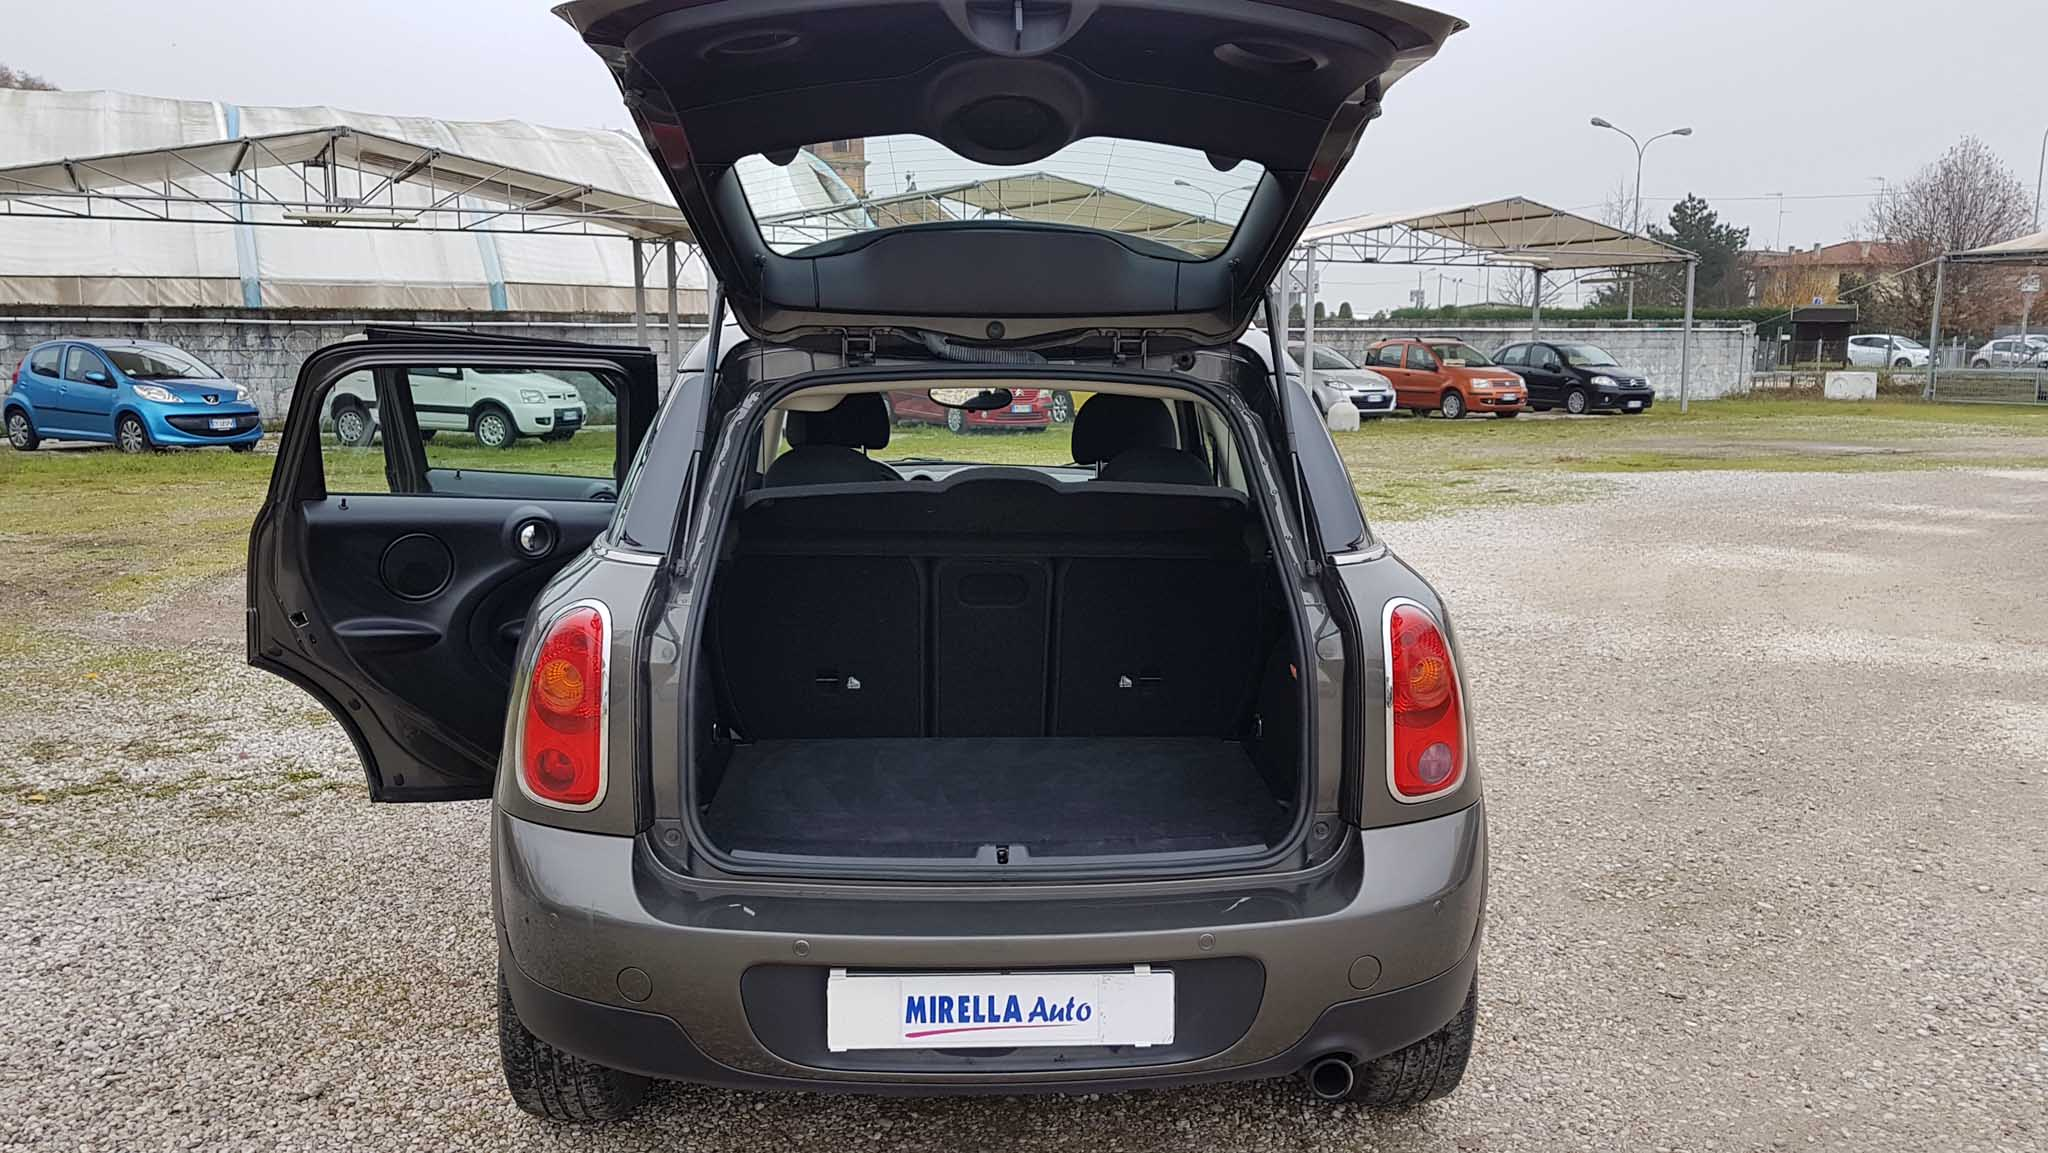 countryman-mirella-auto-20